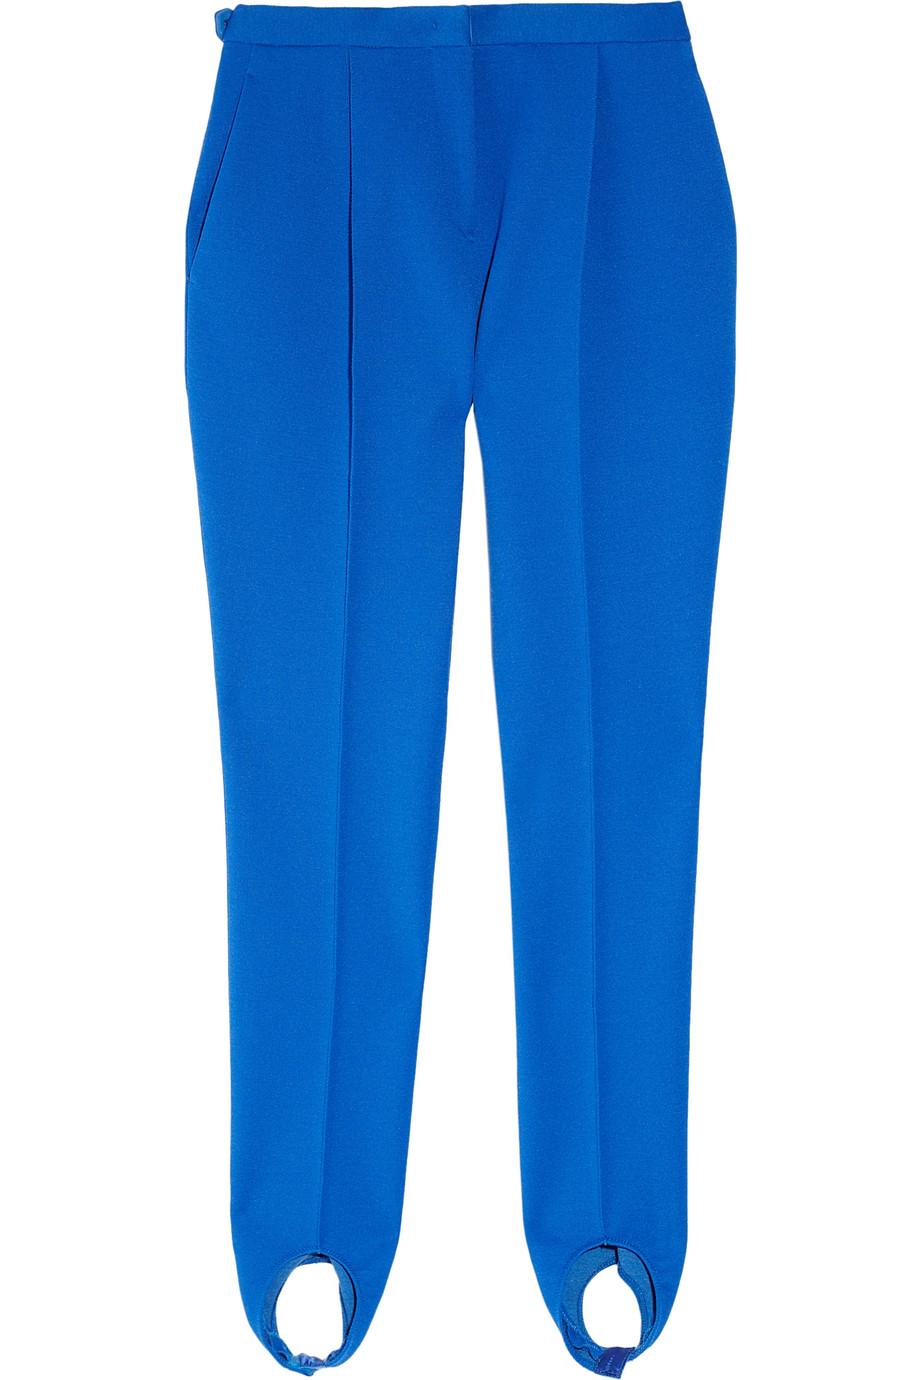 Jil Sander Harvey Short Stretch Wool Crepe Stirrup Pants